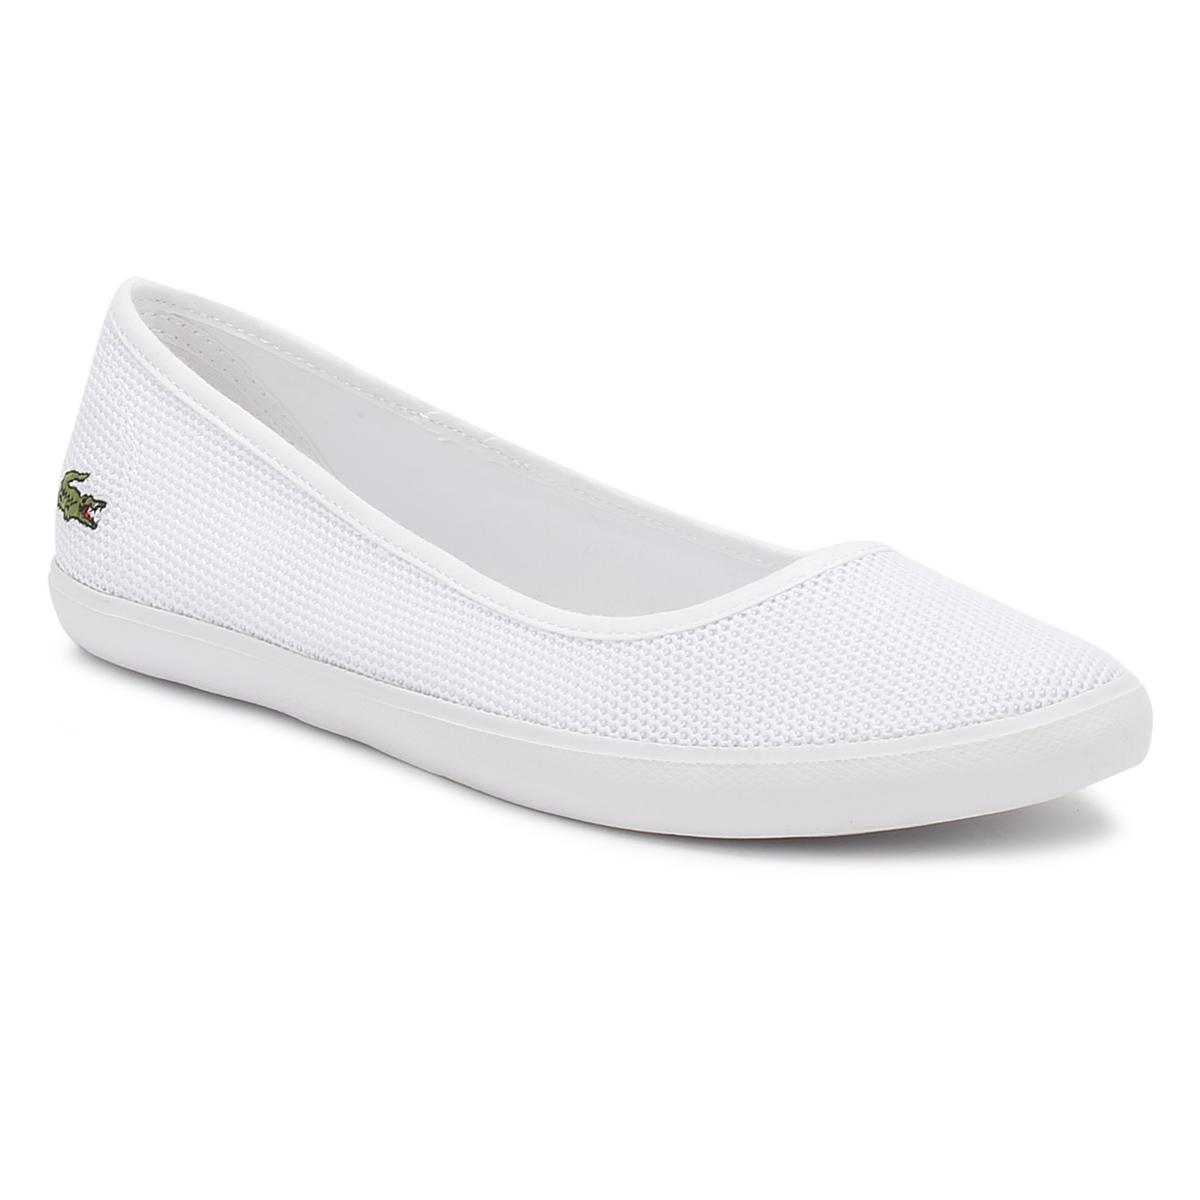 lacoste womens white ballerina shoes textured textile upper ladies flats ebay. Black Bedroom Furniture Sets. Home Design Ideas